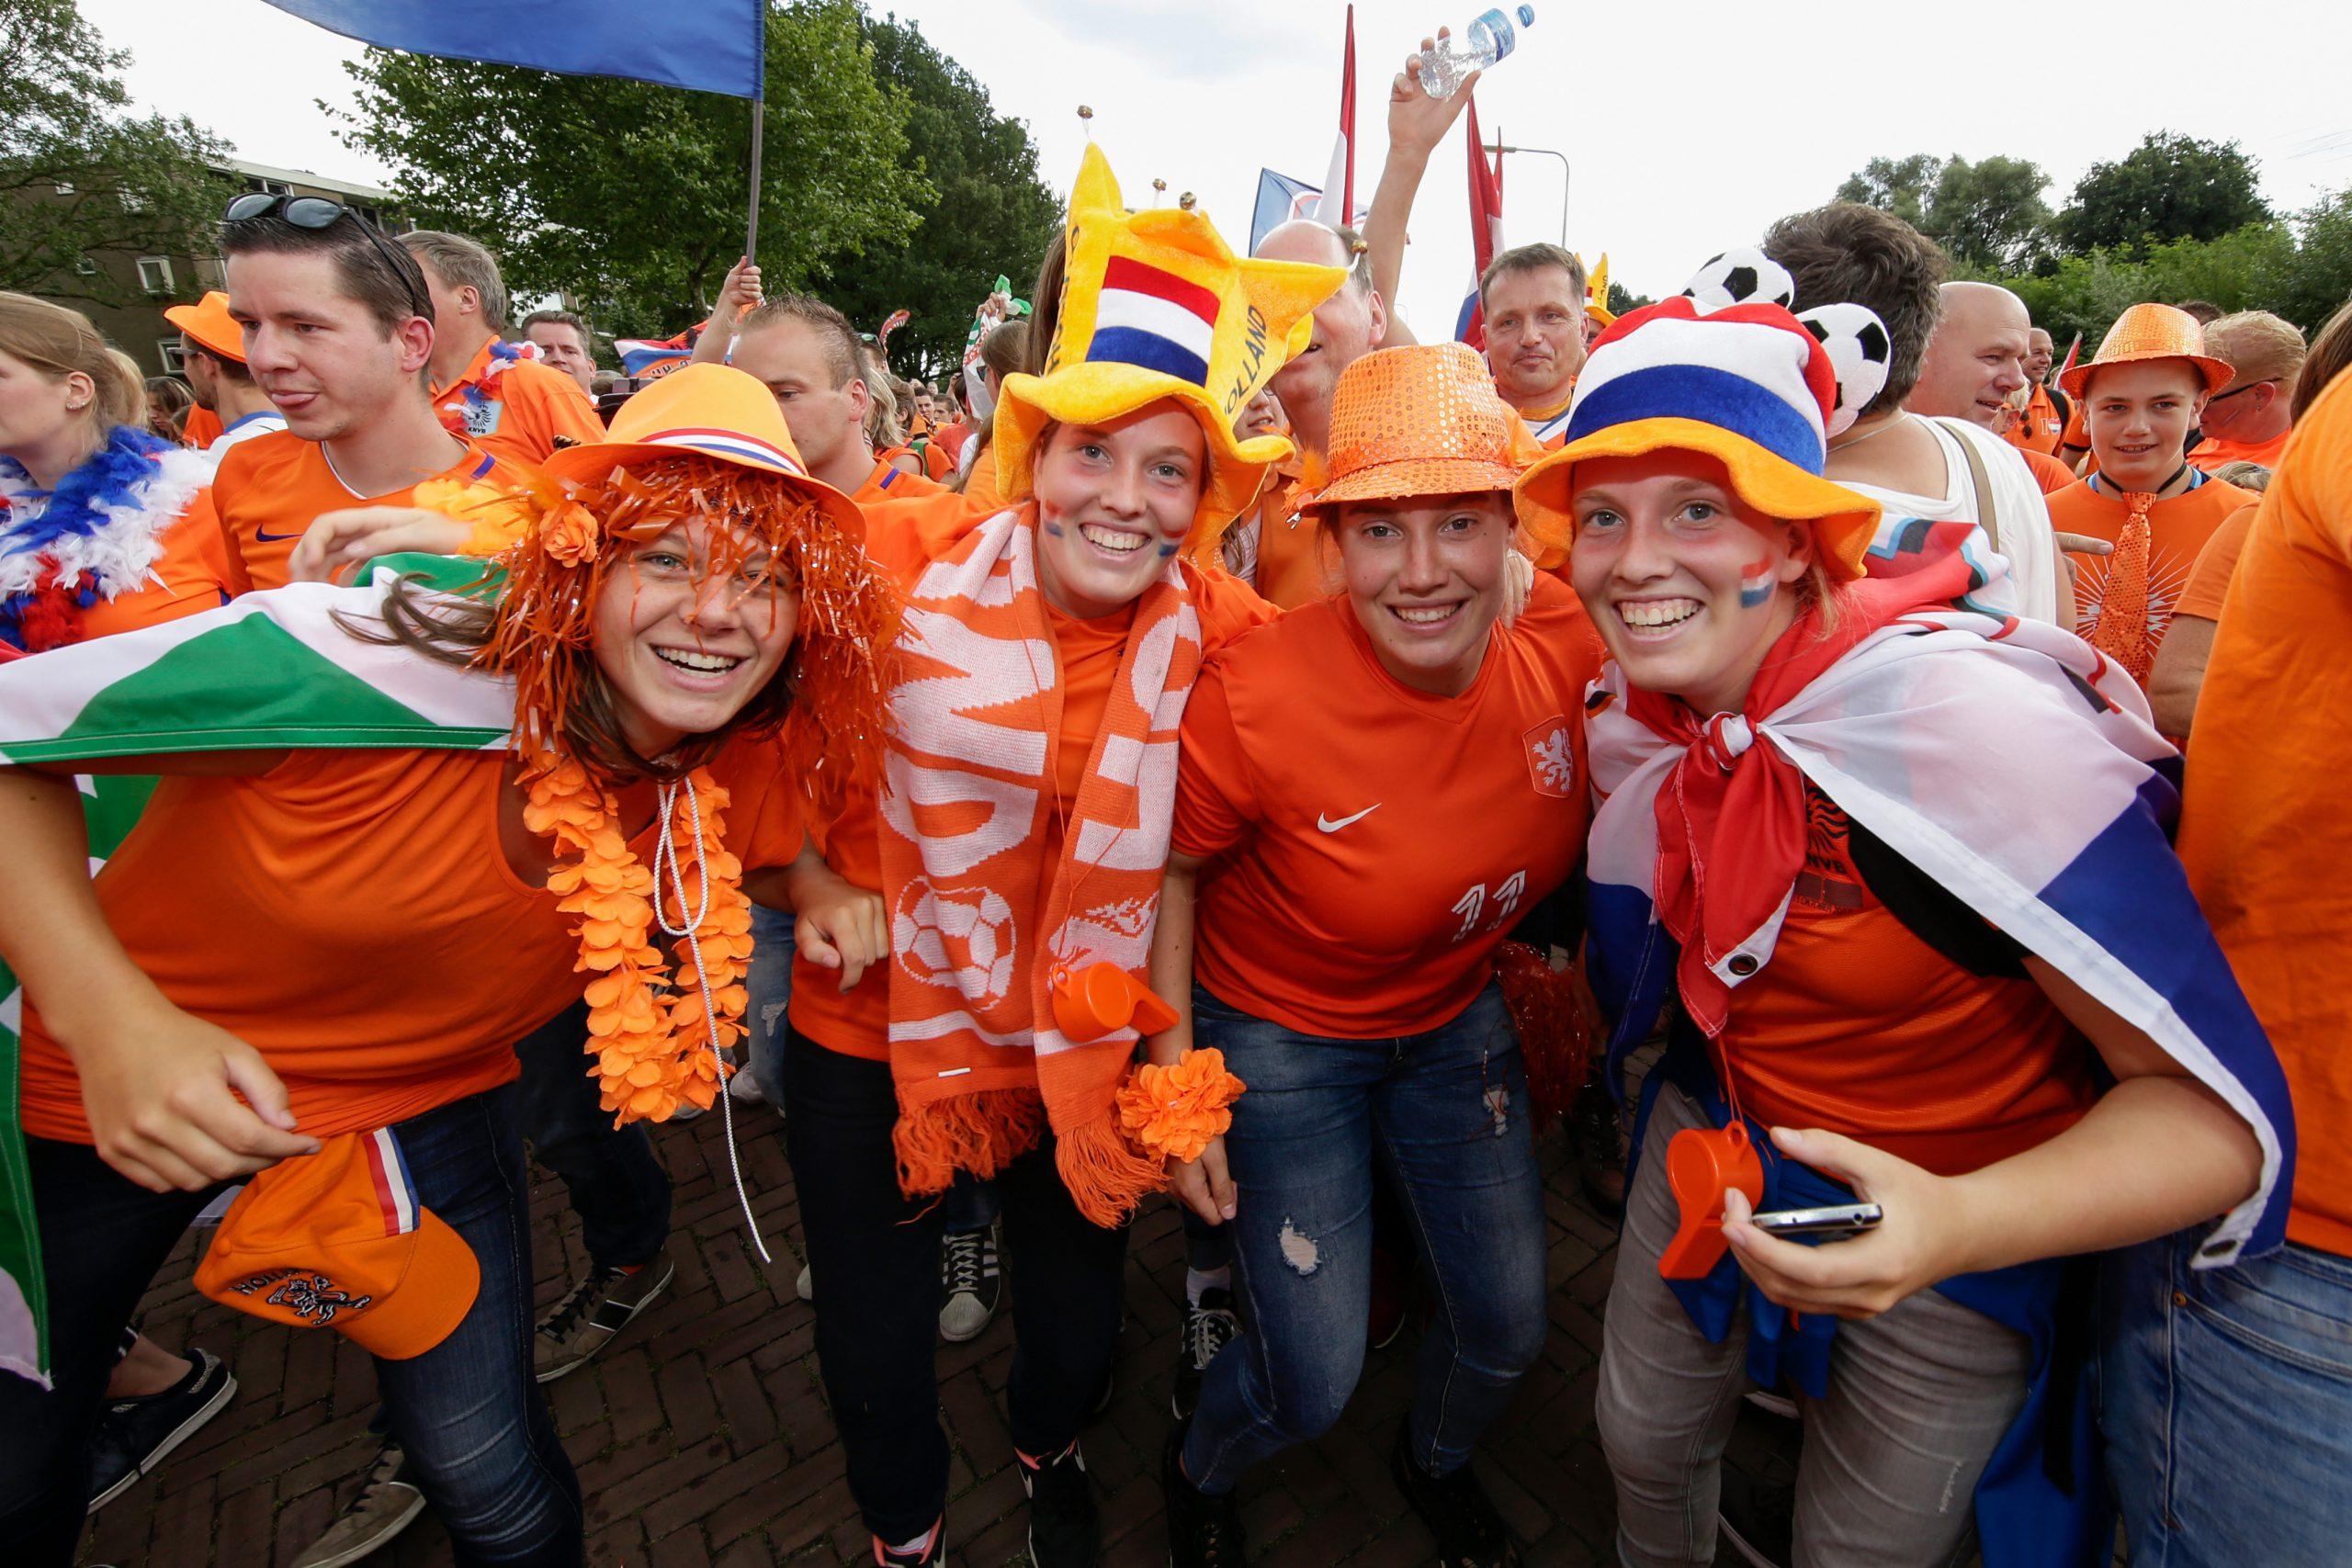 Unicum: Yanmar Stadion gastheer van Jong Oranje